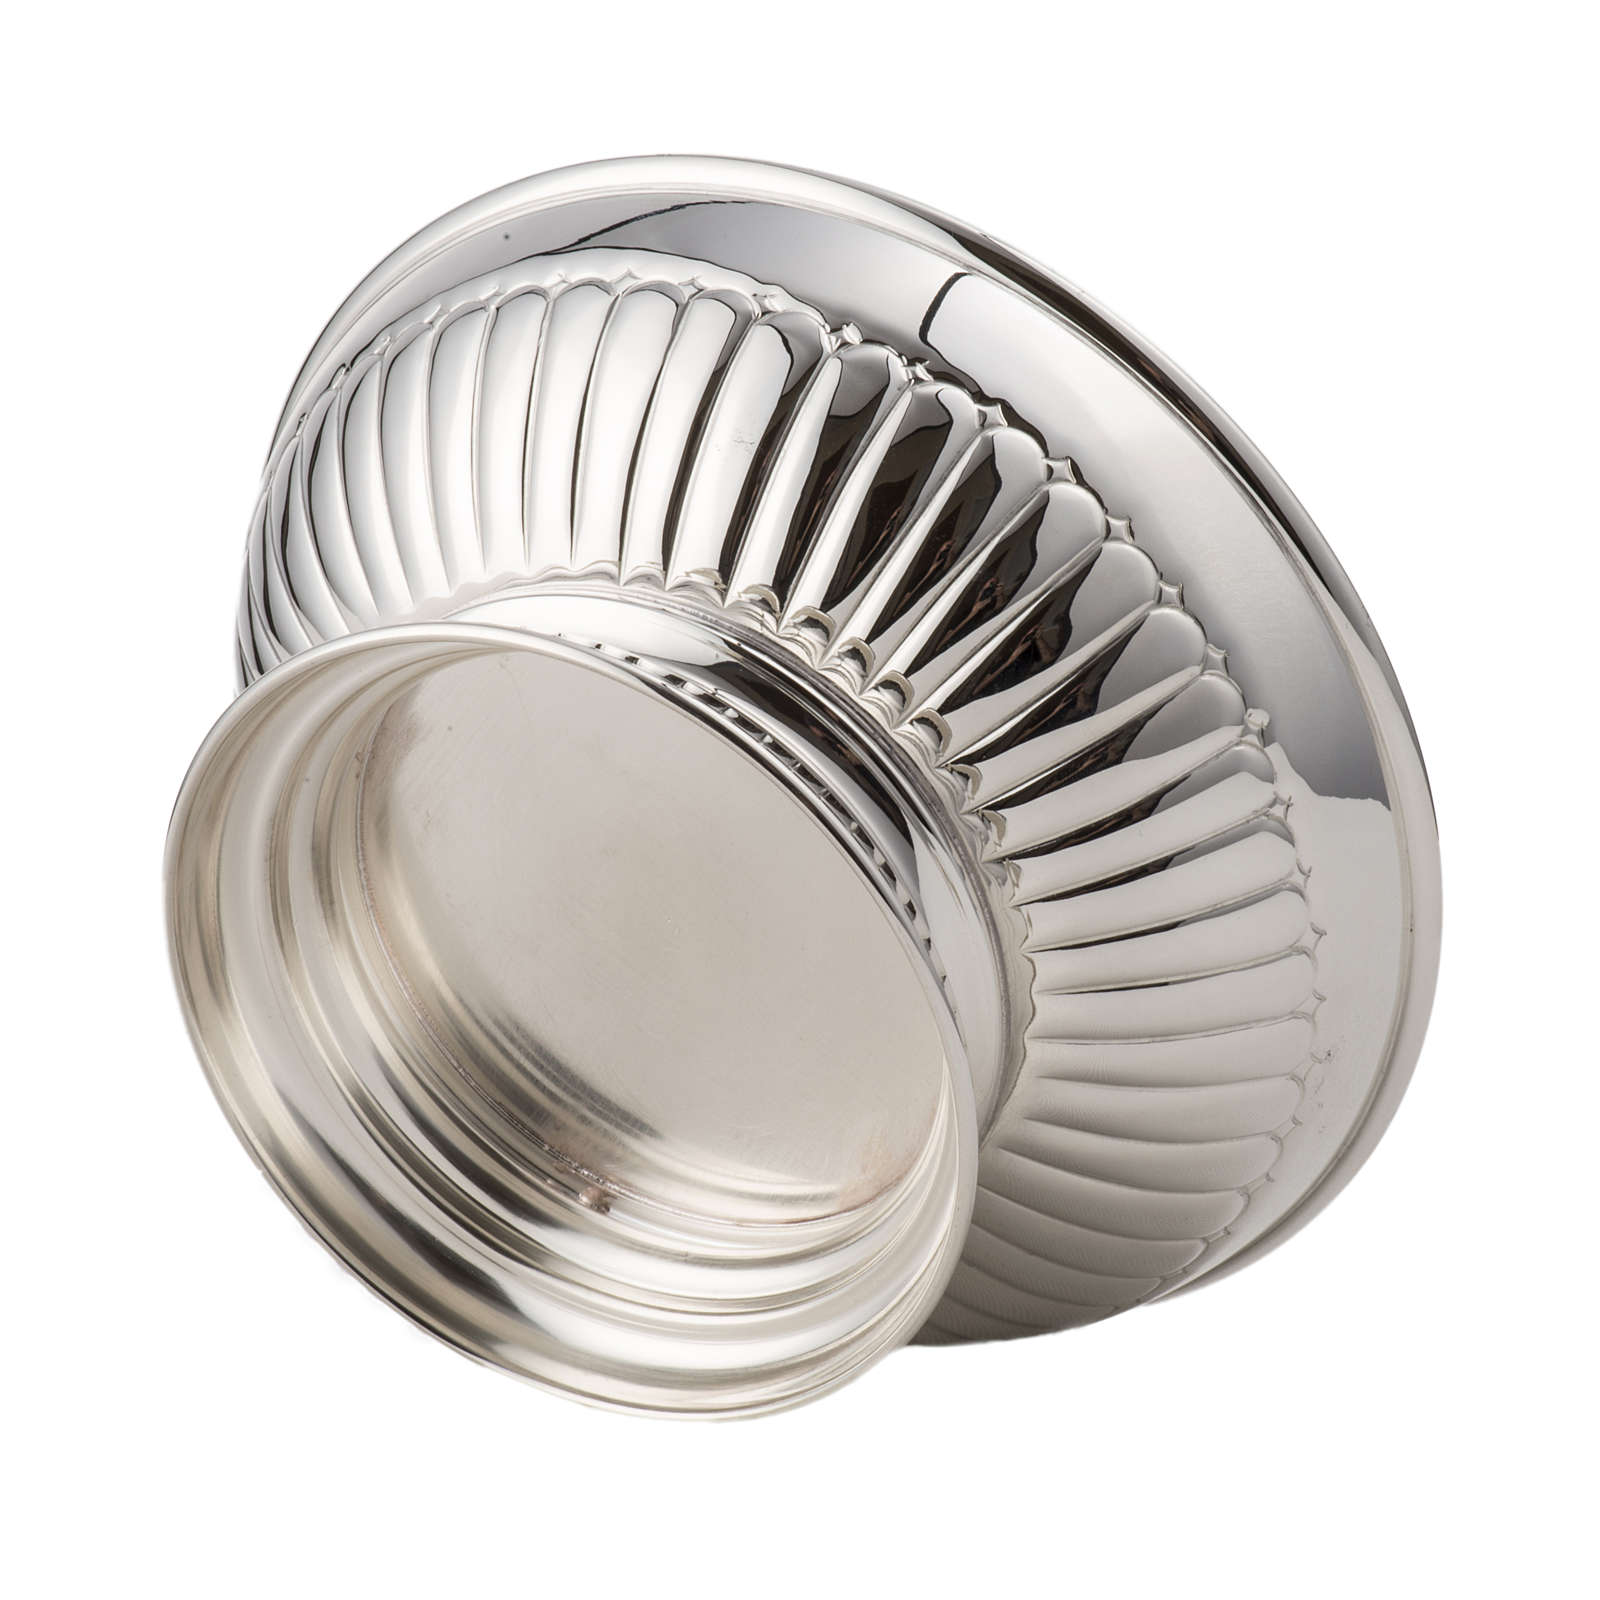 Patena miseczka ze srebra 800 4